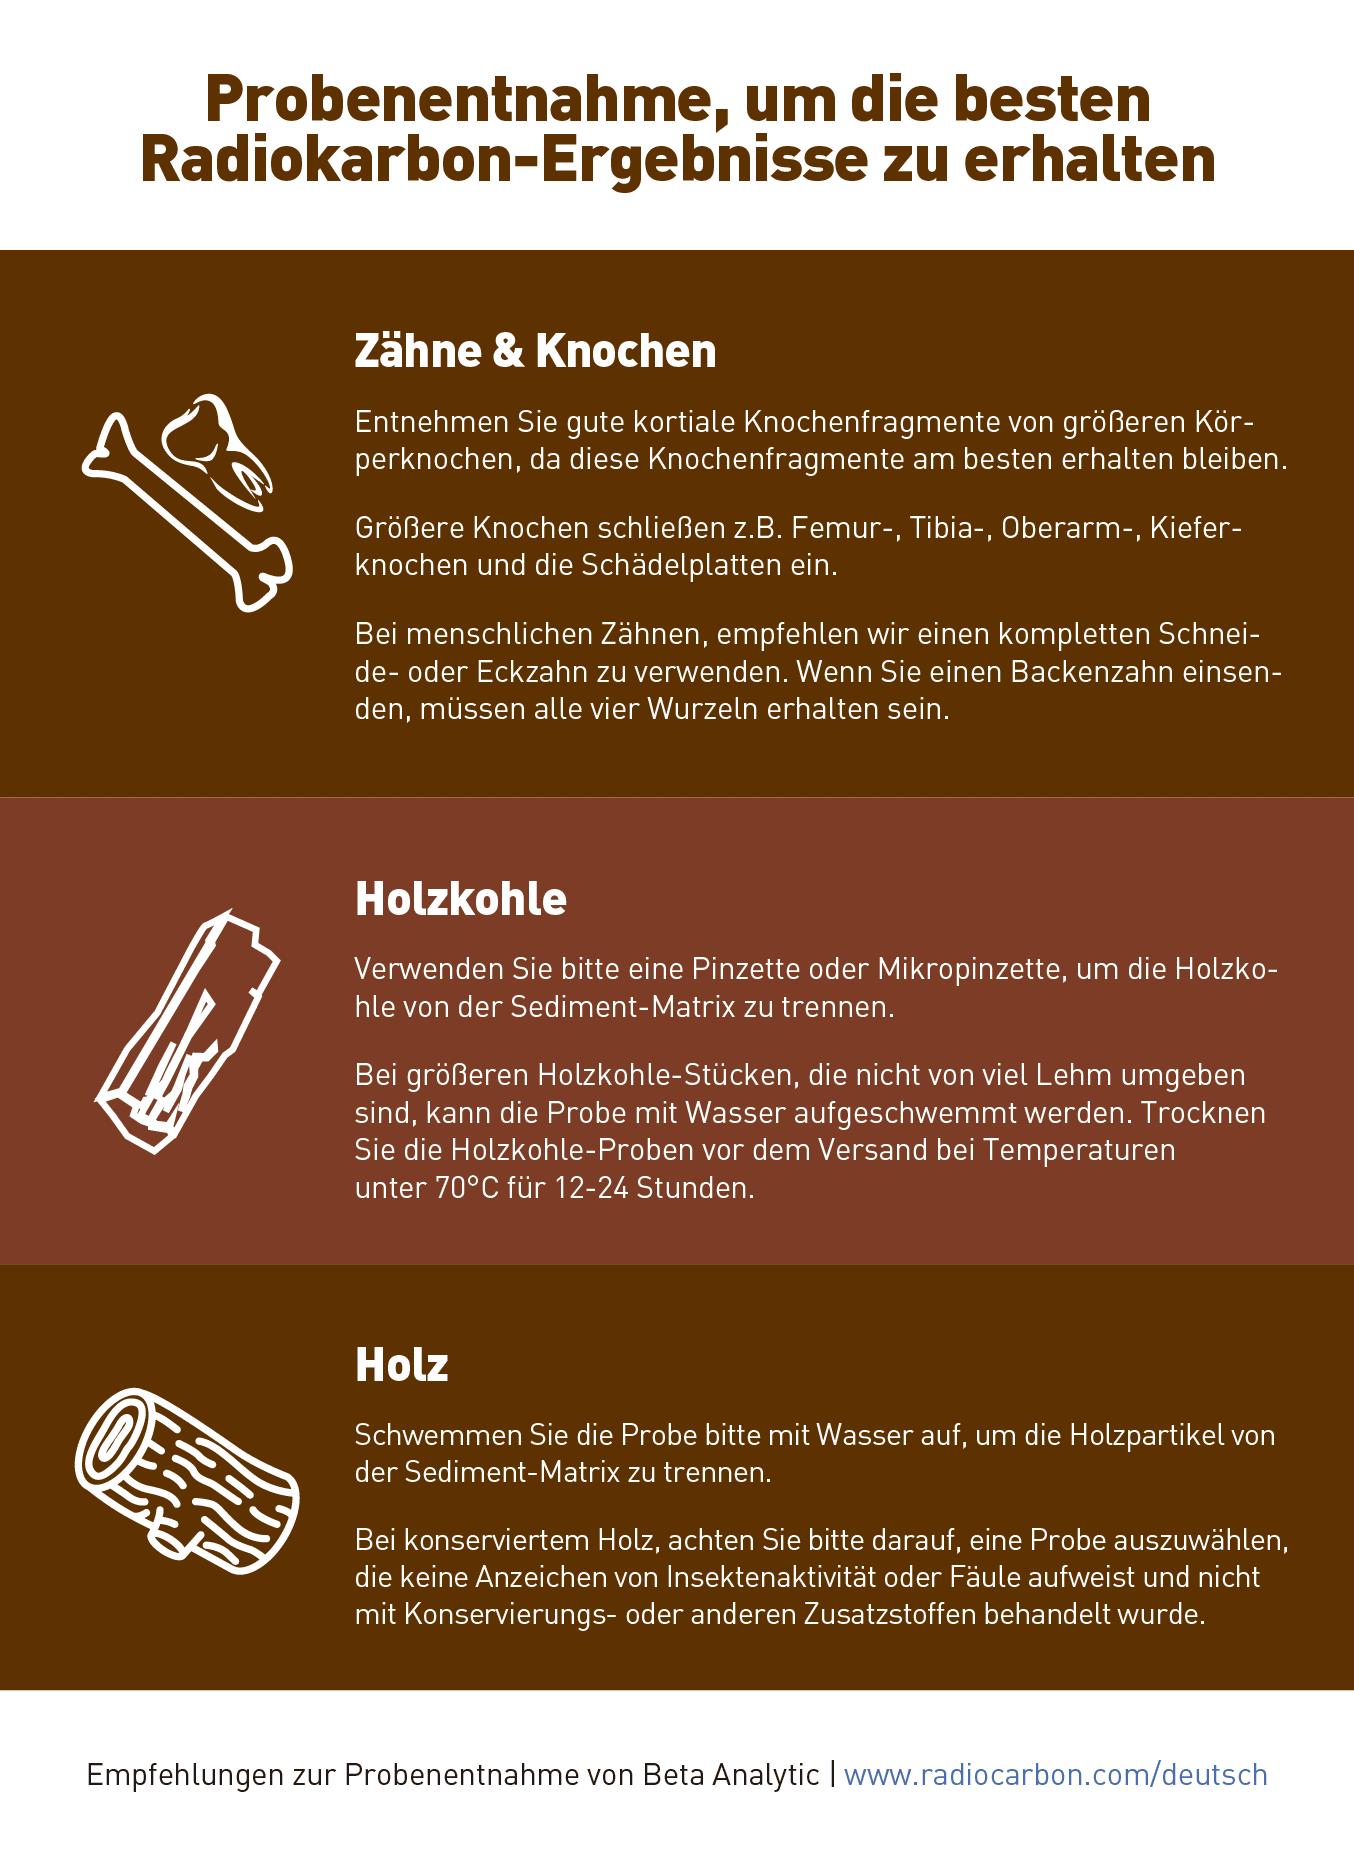 Beta Analytic Sampling Advice Deutsch